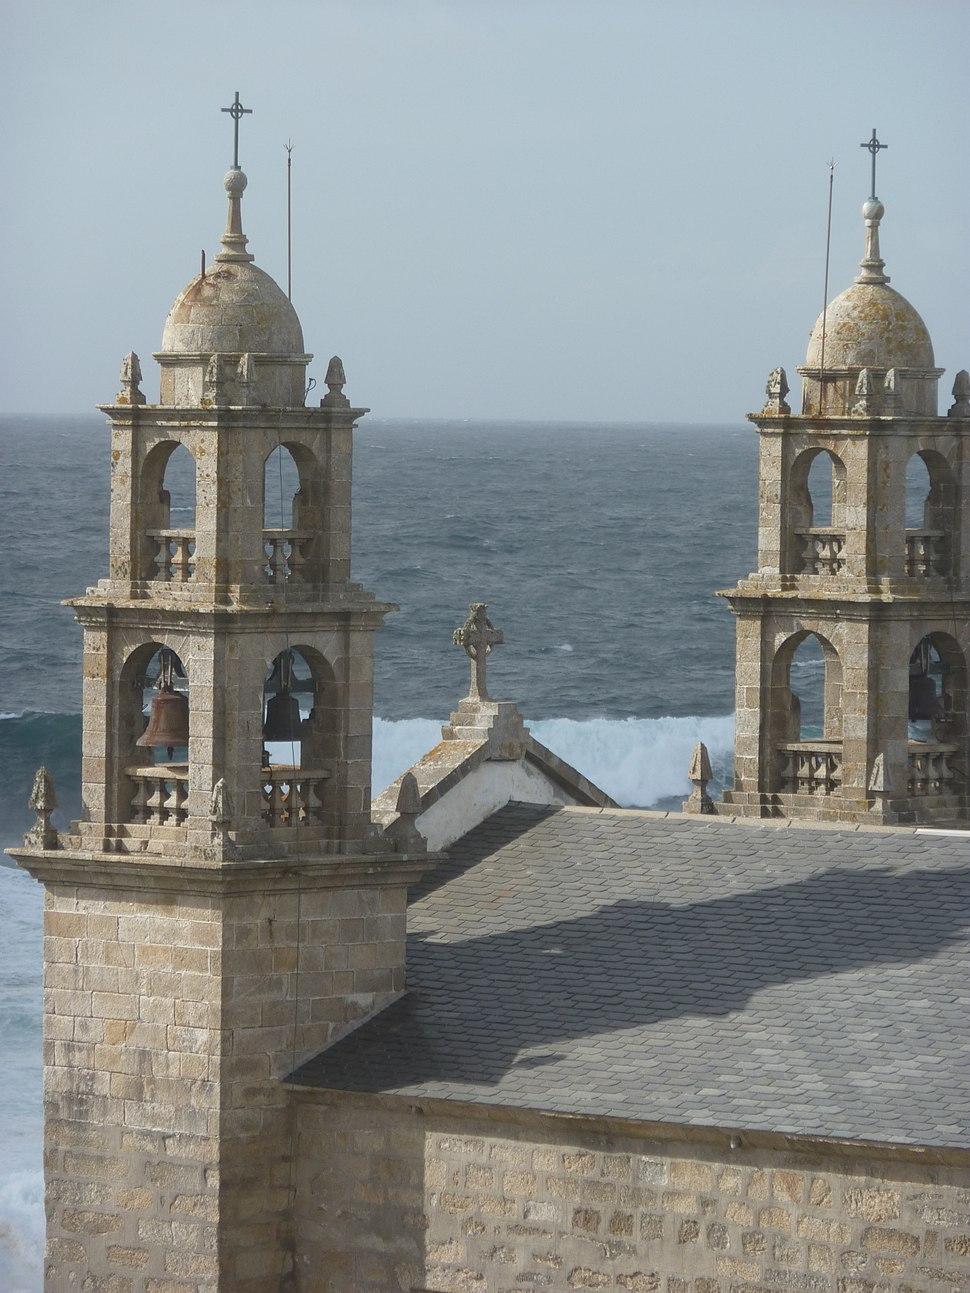 Virxe da Barca